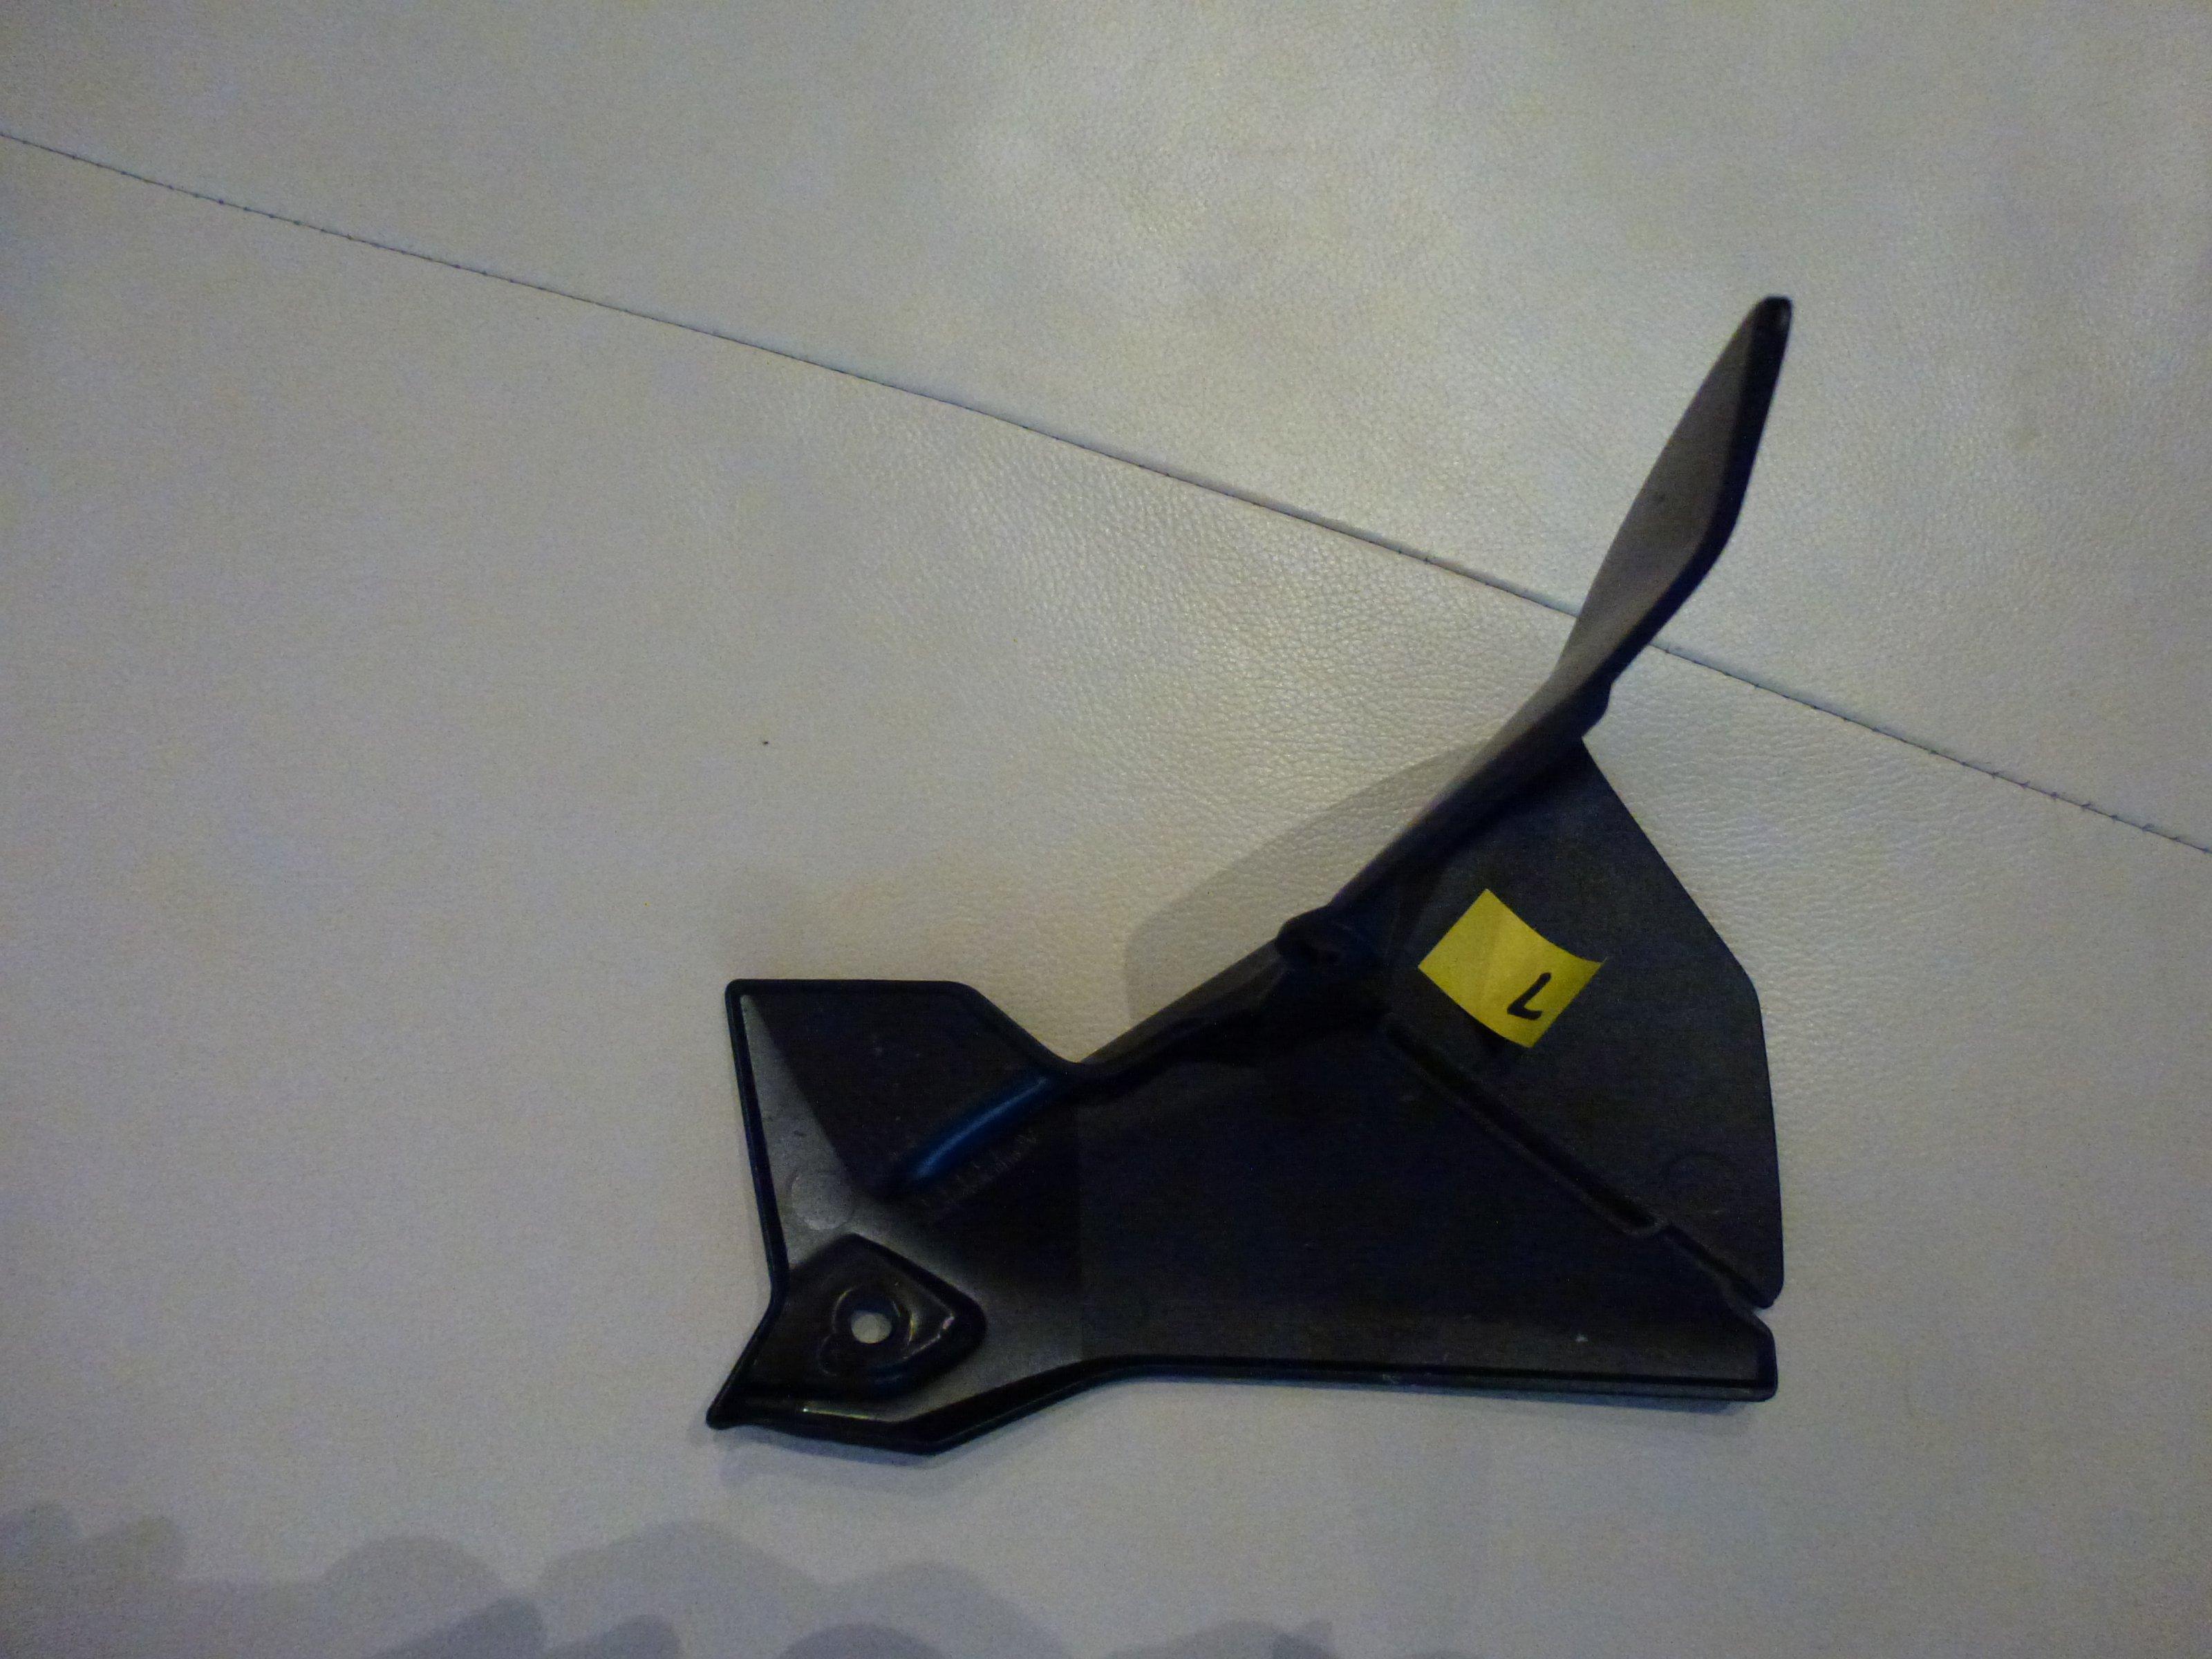 P1050921.JPG